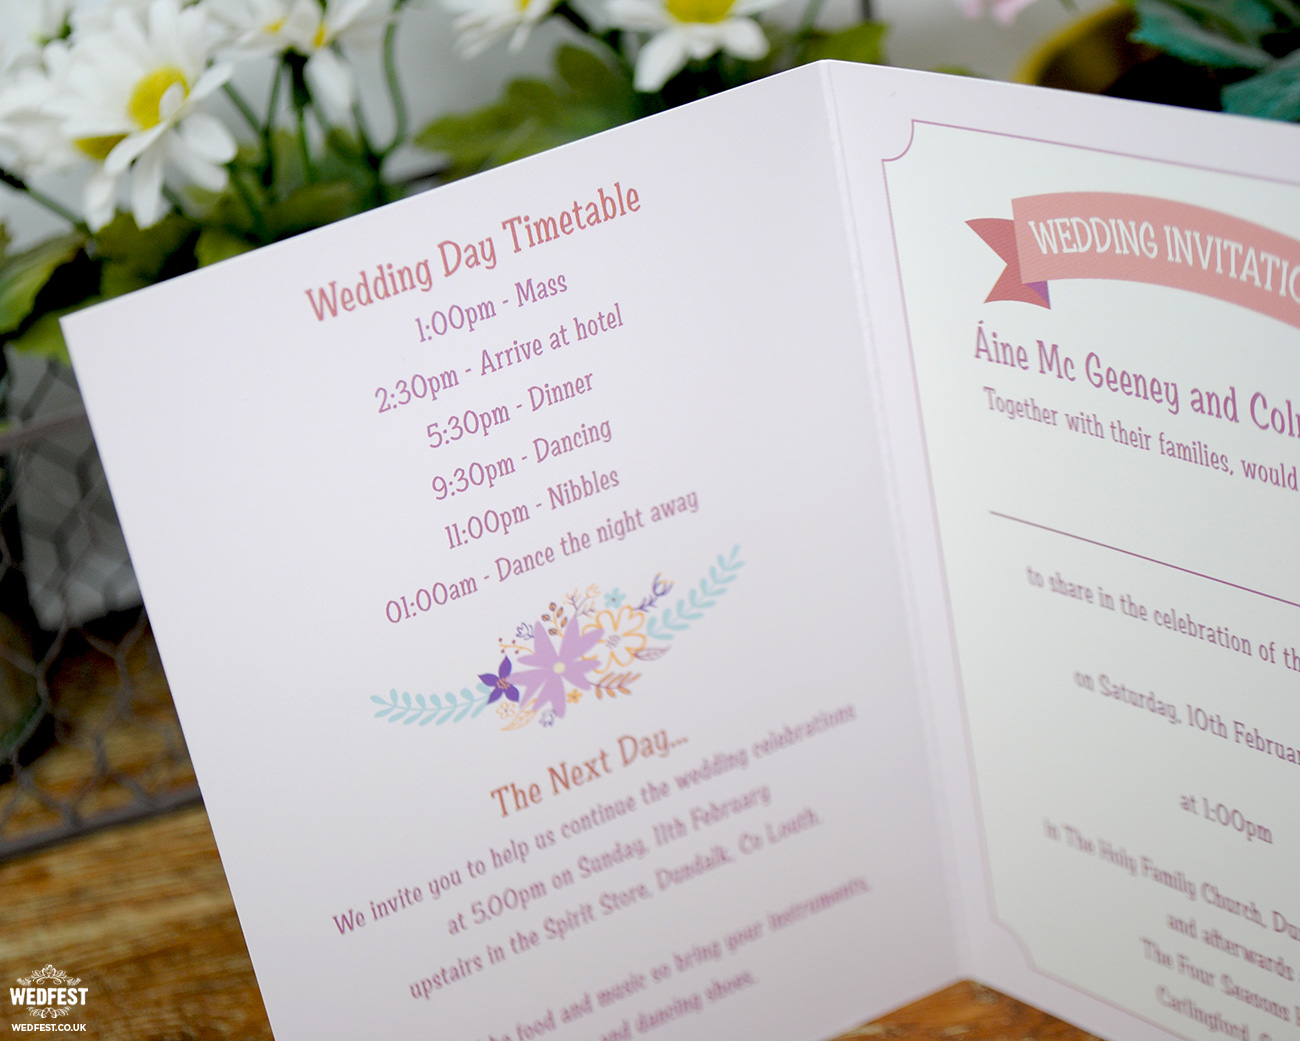 wed fest wedding invitations